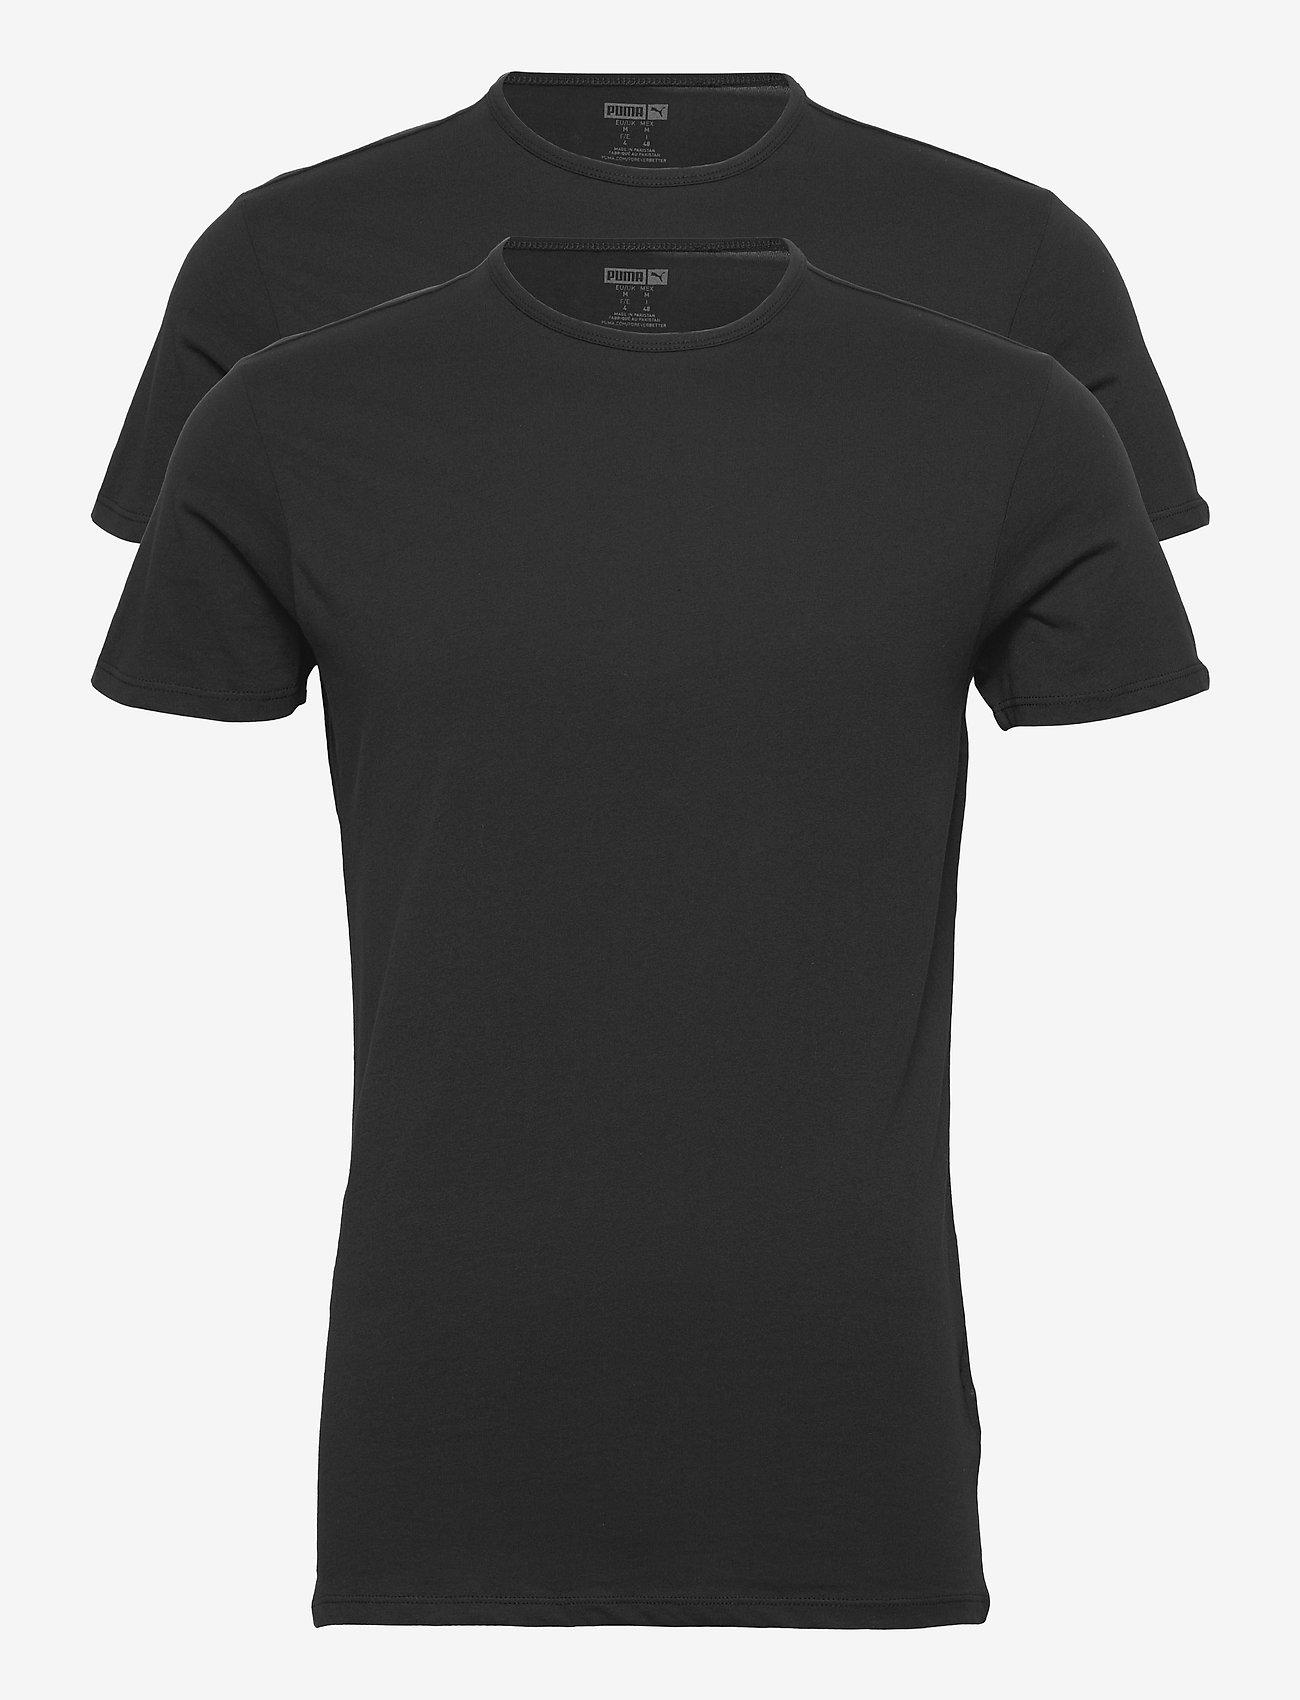 PUMA - PUMA BASIC 2P CREW TEE - t-shirts - black - 1